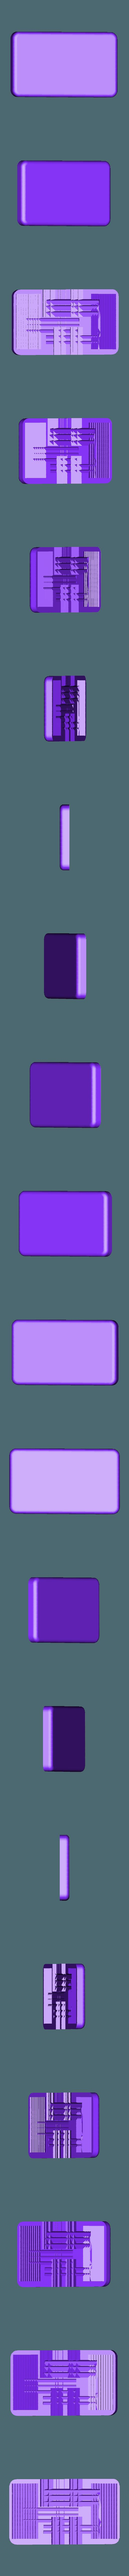 Trasparent_Headlights_4pc.stl Descargar archivo STL CHEVY VAN G20 RC BODY SCALER AXIAL MST TRX4 RC4WD • Modelo para imprimir en 3D, ilyakapitonov